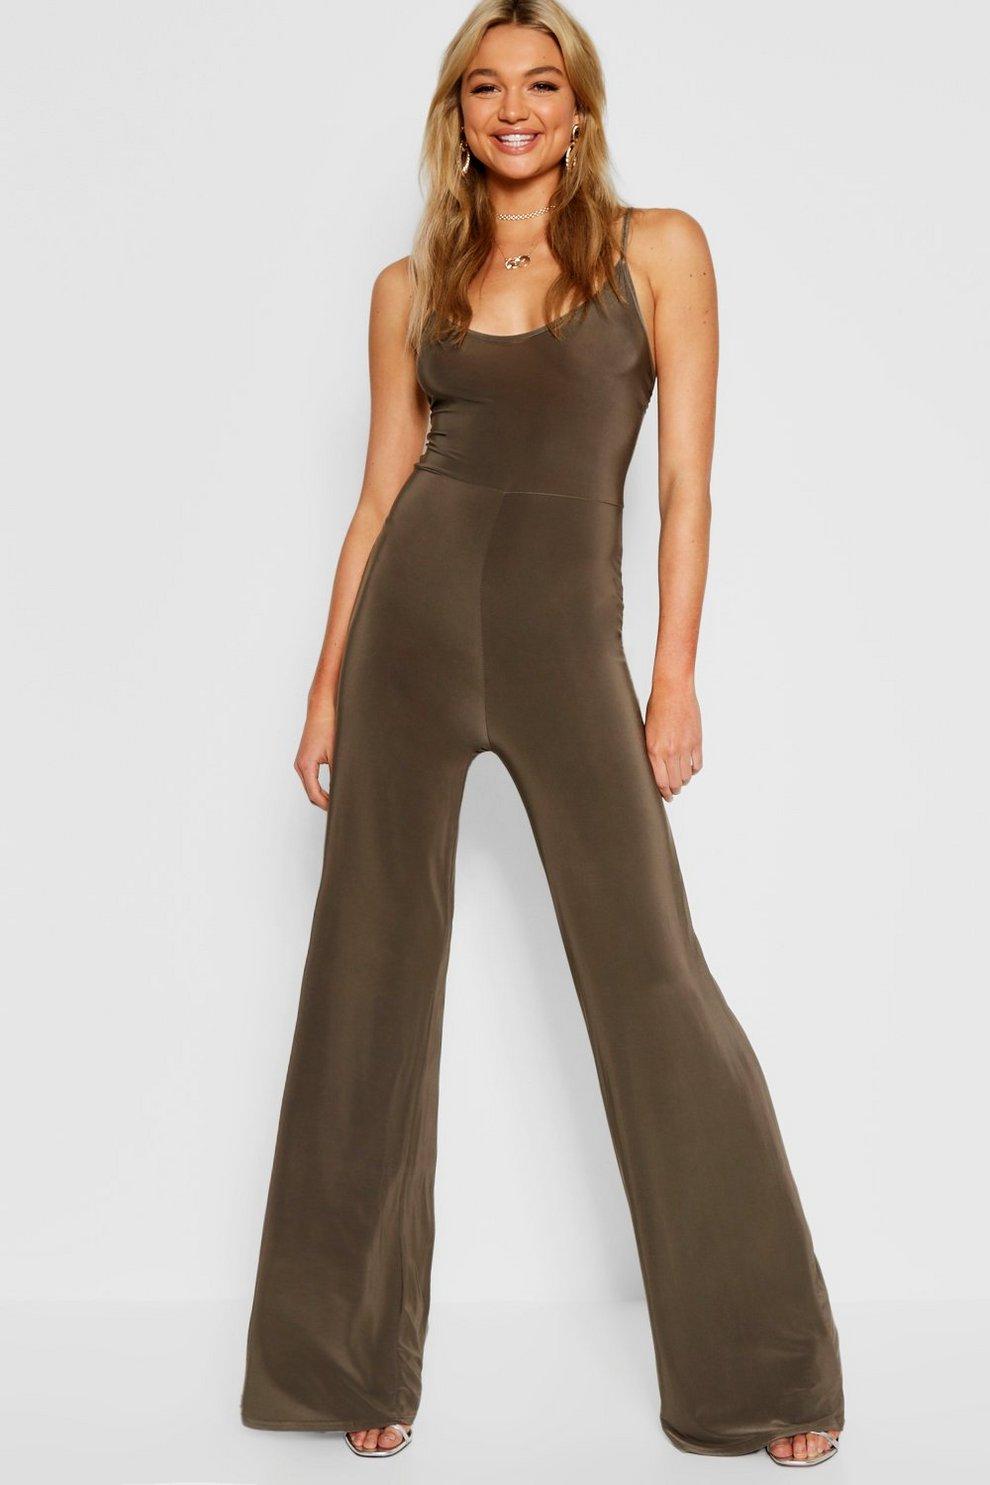 a8624ea83a5 Black Knitted Long Sleeve Plunge Wide Leg Jumpsuit - raveitsafe